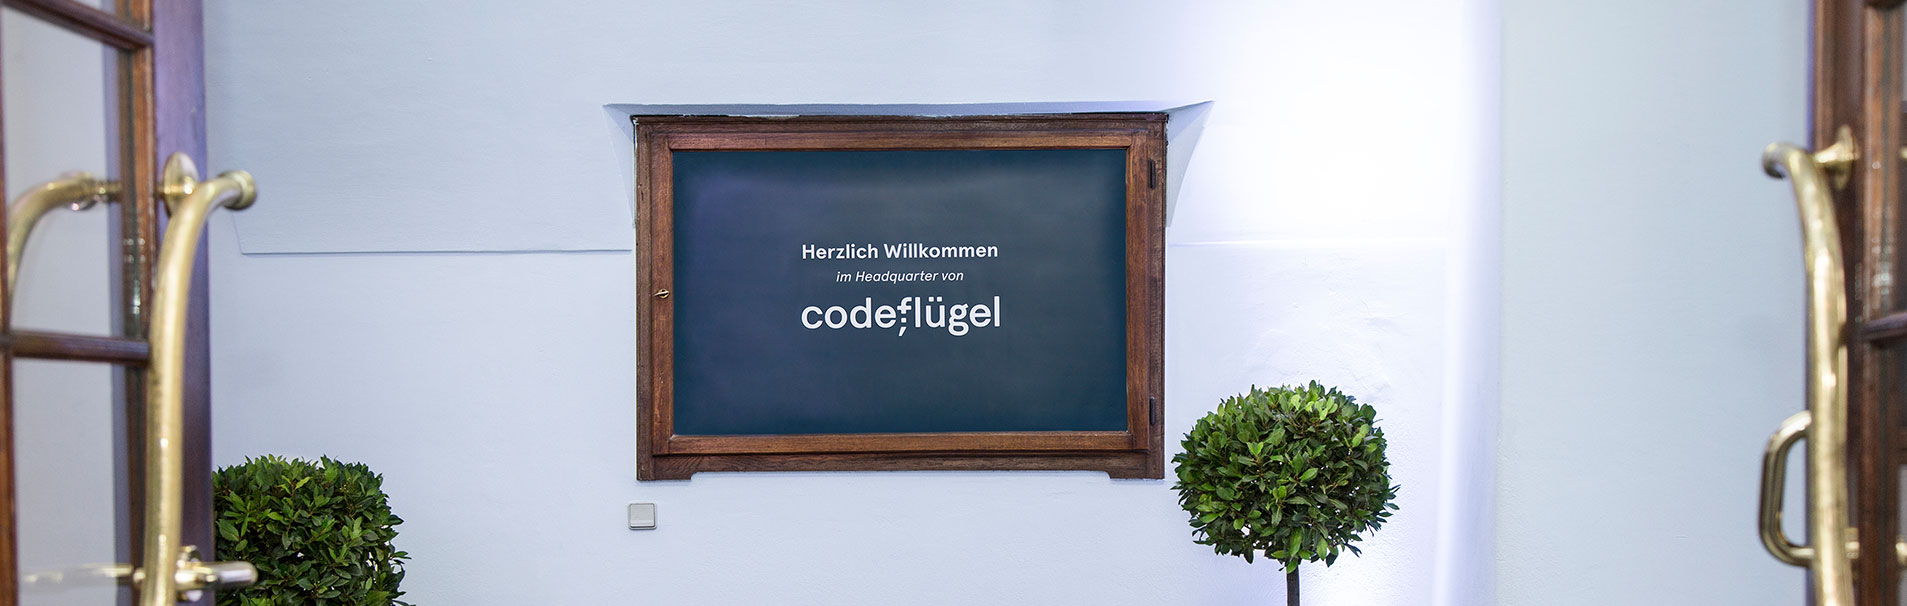 codeflügel über uns Team Unternehmenskultur